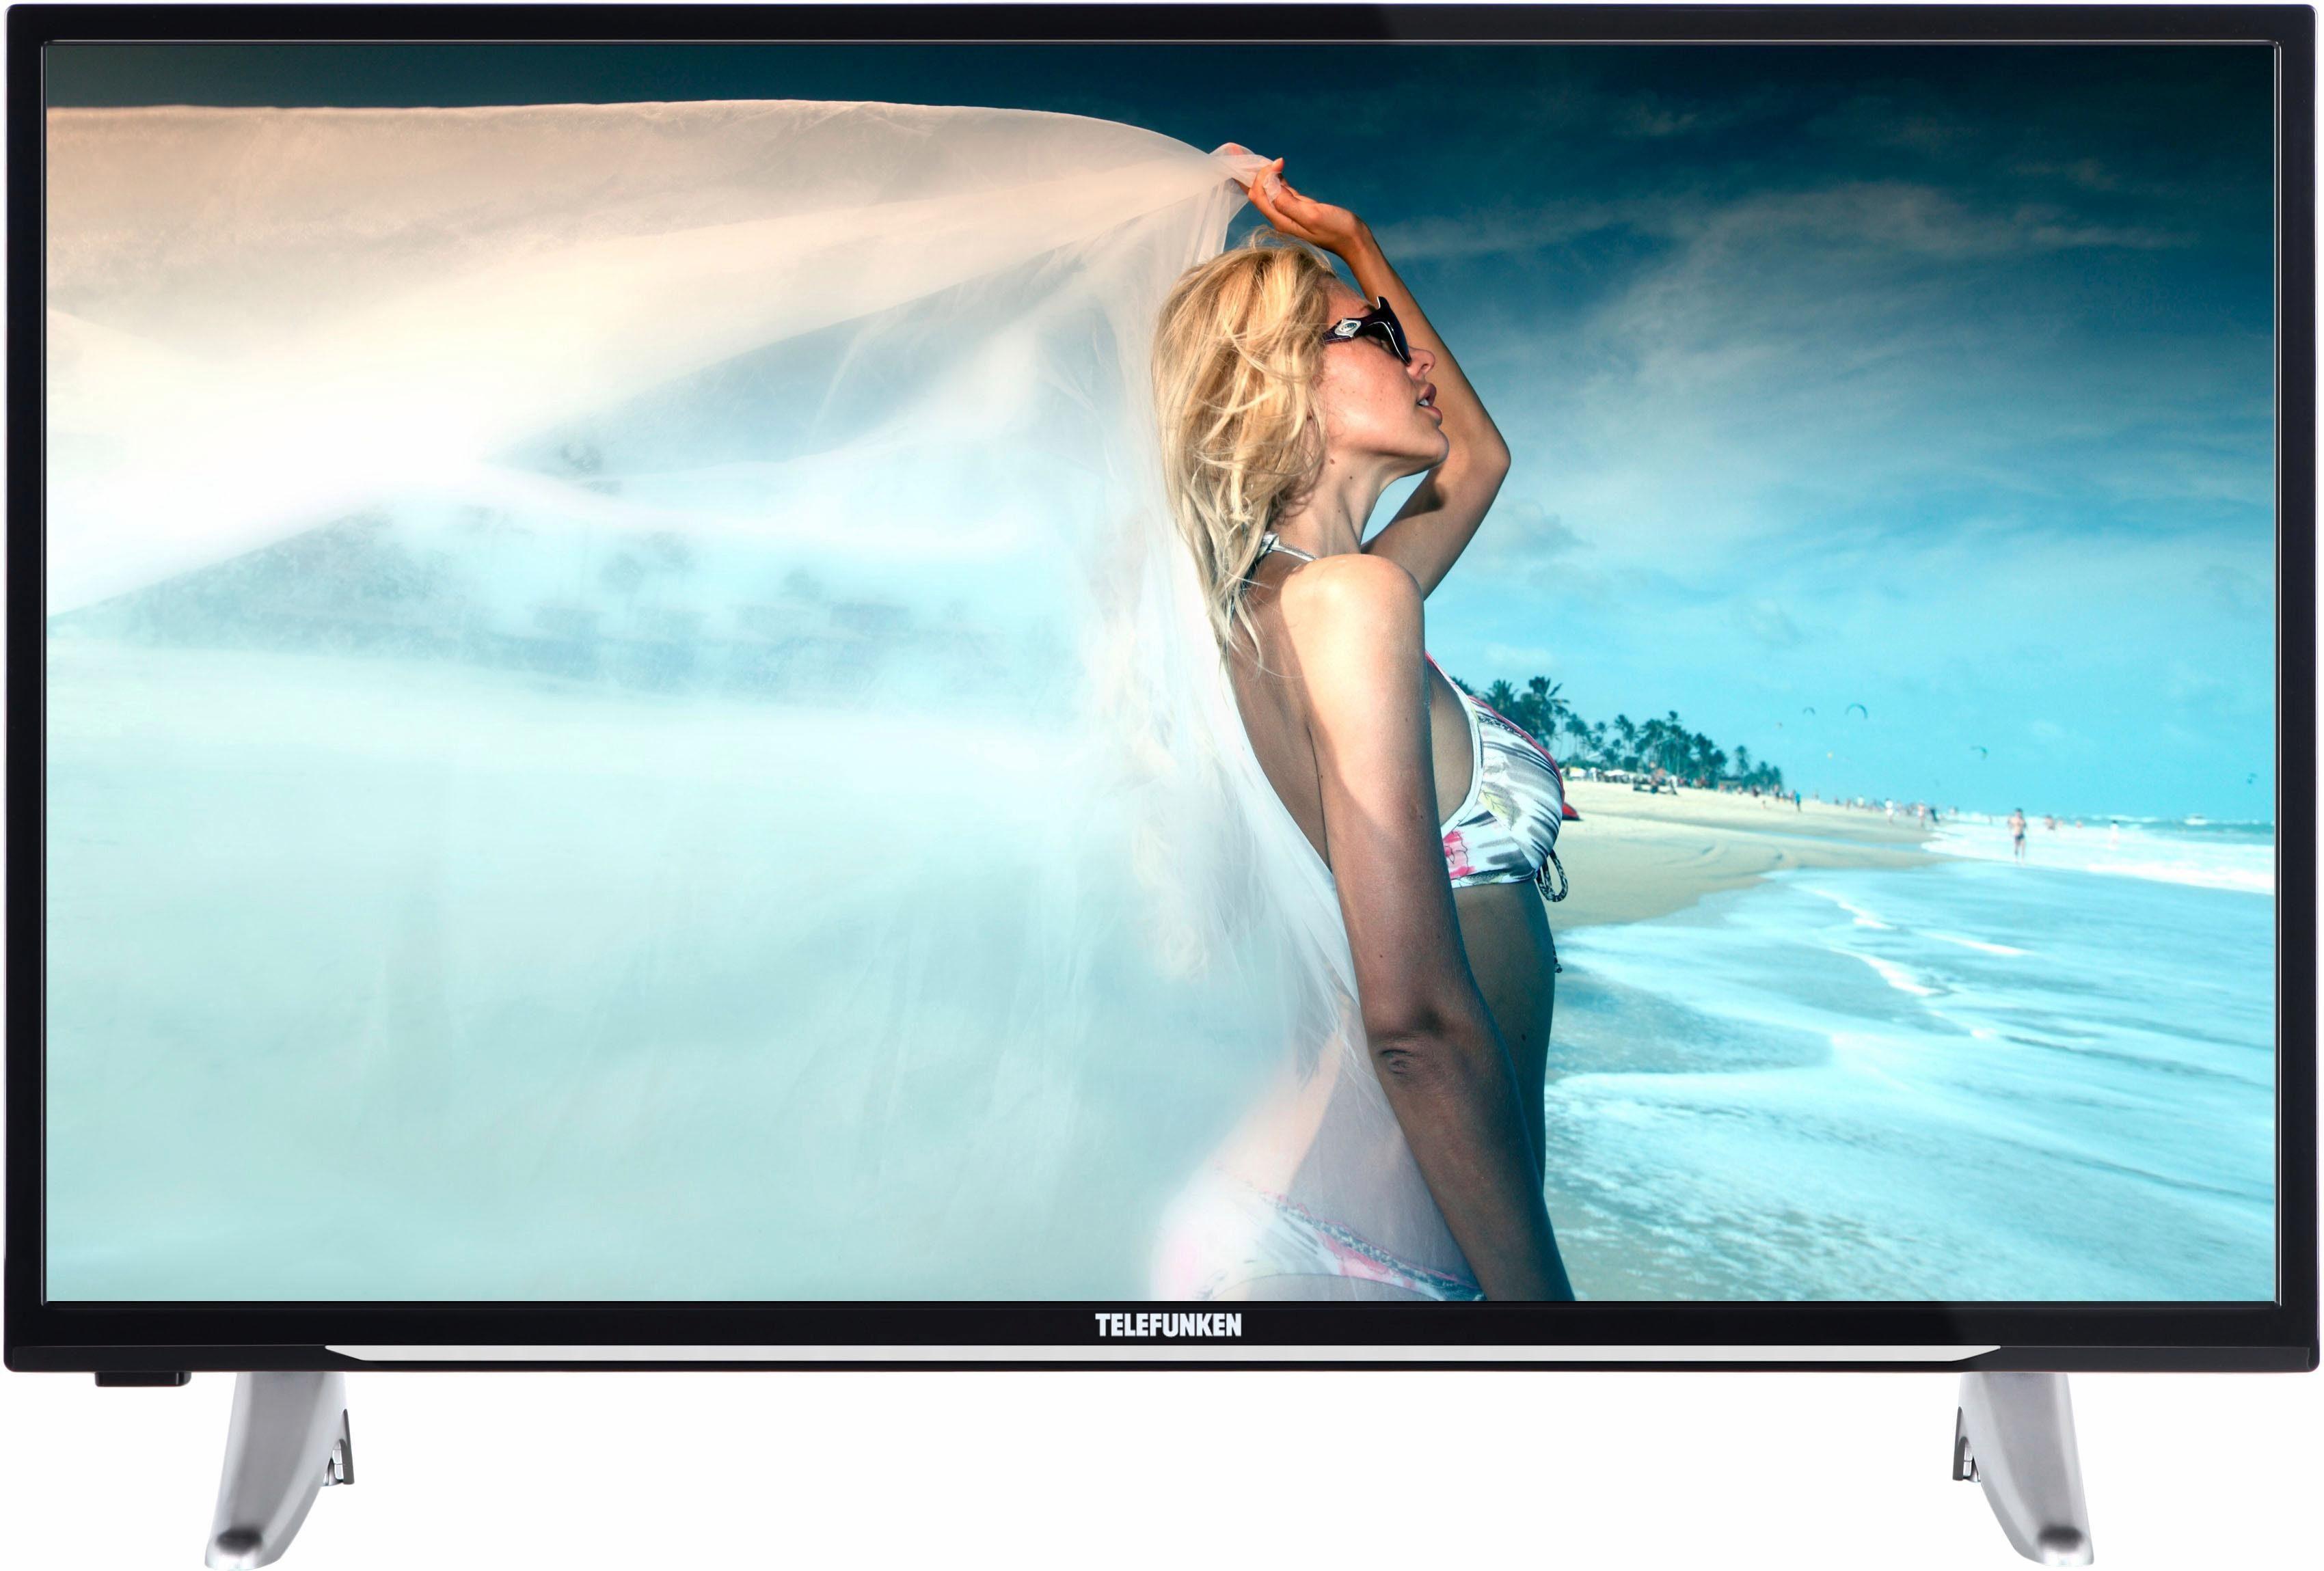 Telefunken OS-32H100 LED-Fernseher (81 cm/32 Zoll, HD)